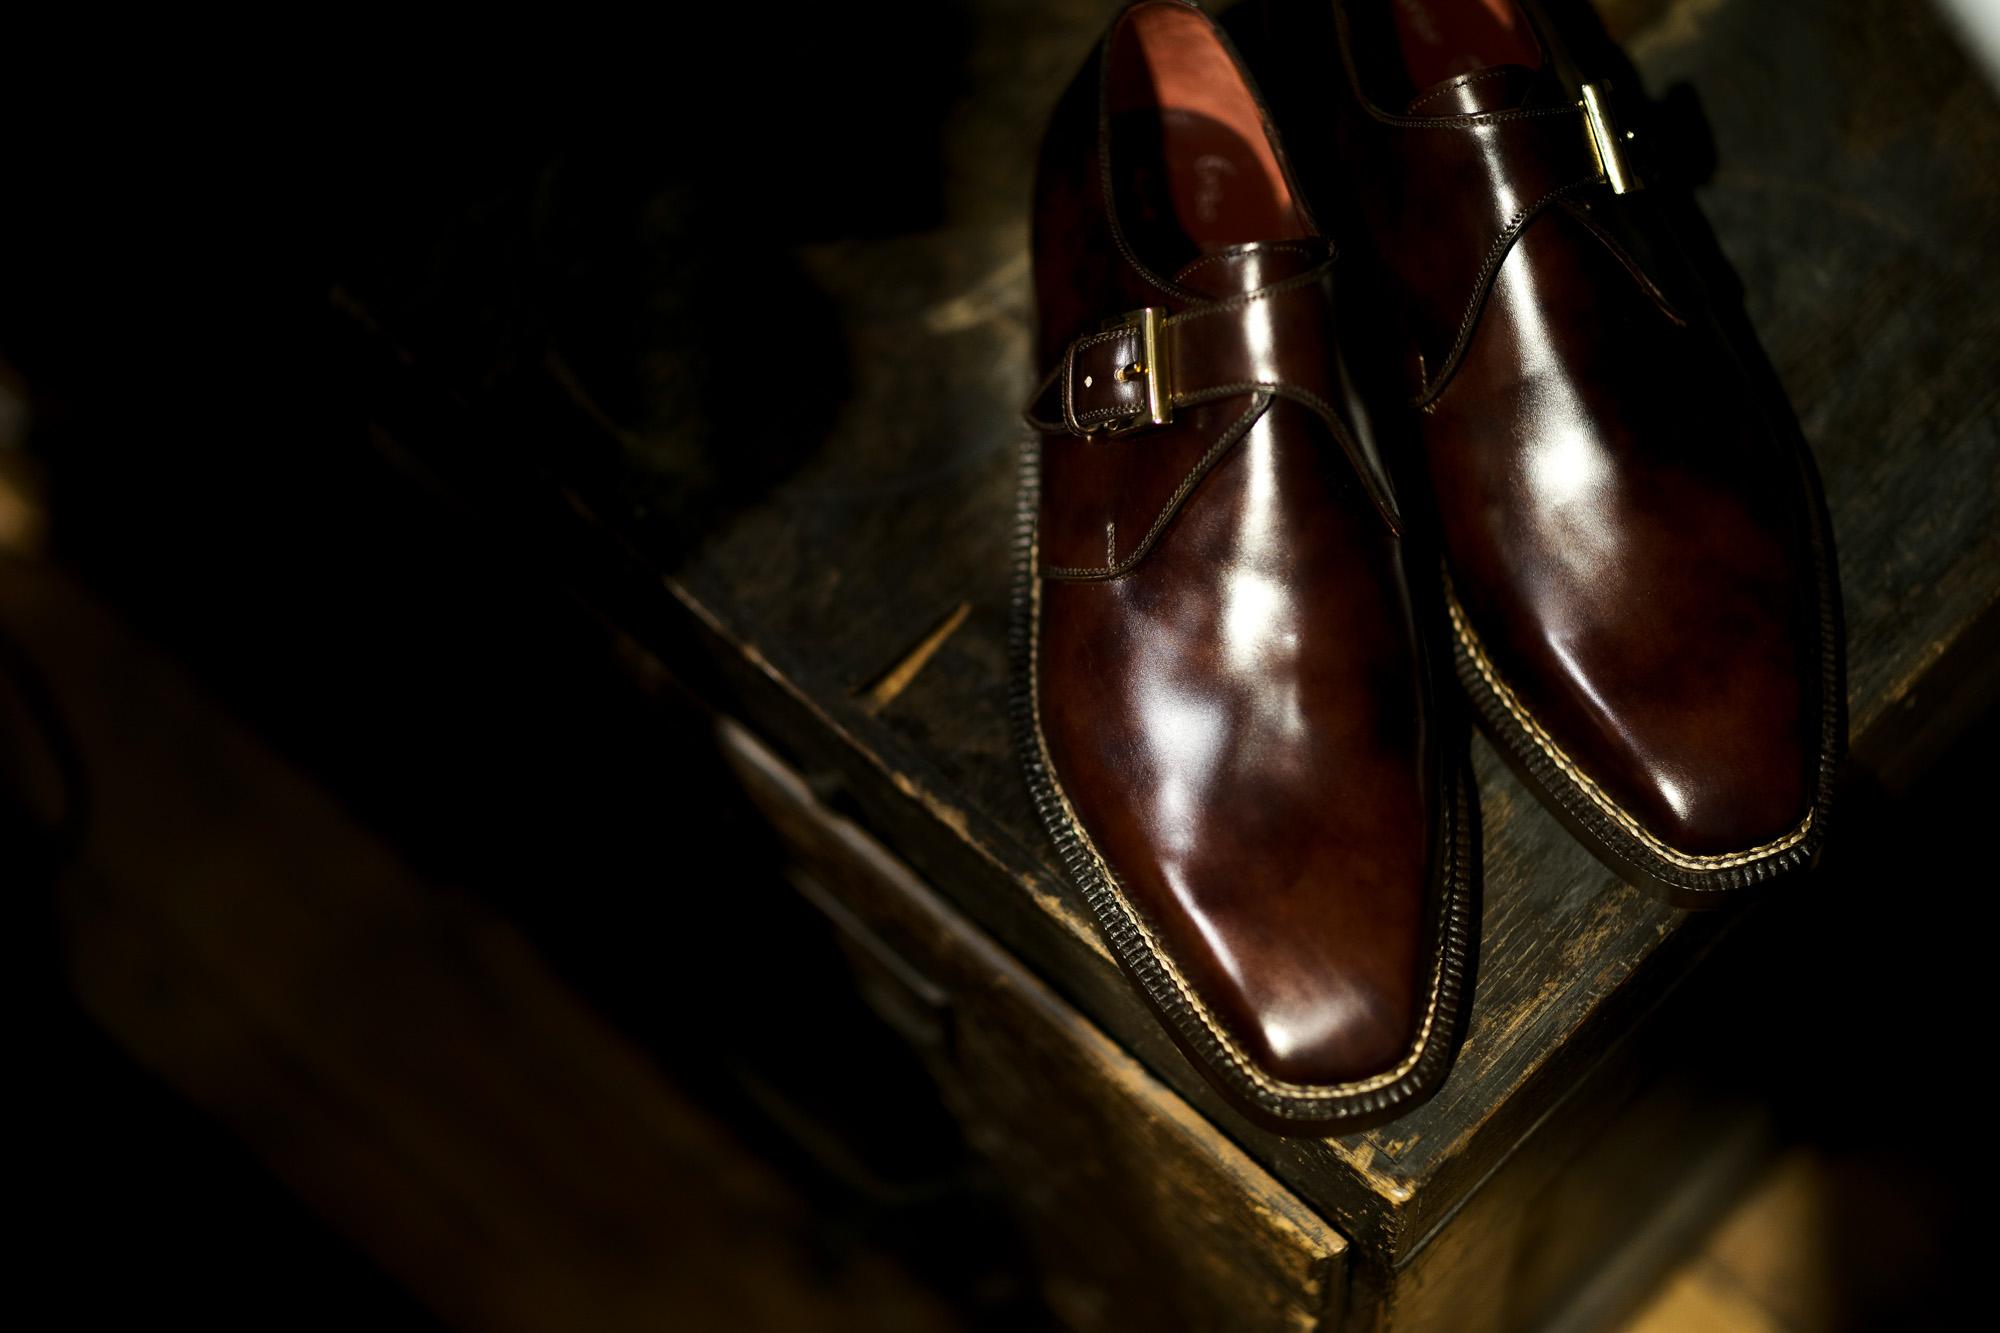 "ENZO BONAFE ""ART.3721"" Single Monk Strap Shoes MUSEUM CALF DARK BROWN 2021 エンツォボナフェ シングルモンクストラップシューズ ミュージアムカーフ ダークブラウン 愛知 名古屋 Alto e Diritto altoediritto アルトエデリット"